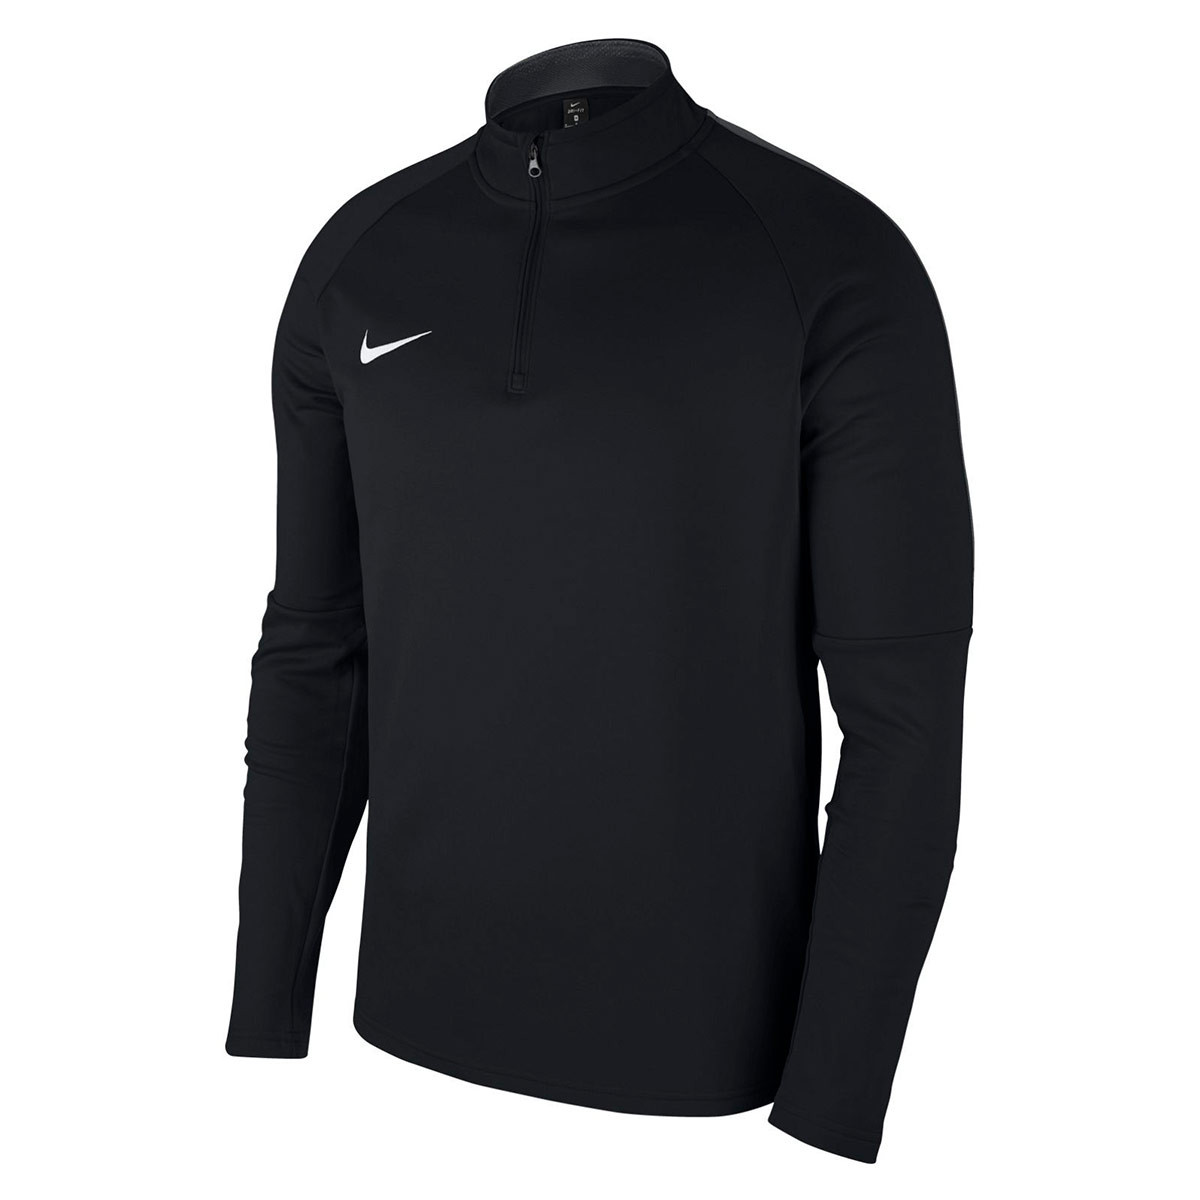 a3ee36bcdf8 Sweatshirt Nike Academy 18 Drill Niño Black-Anthracite-White ...